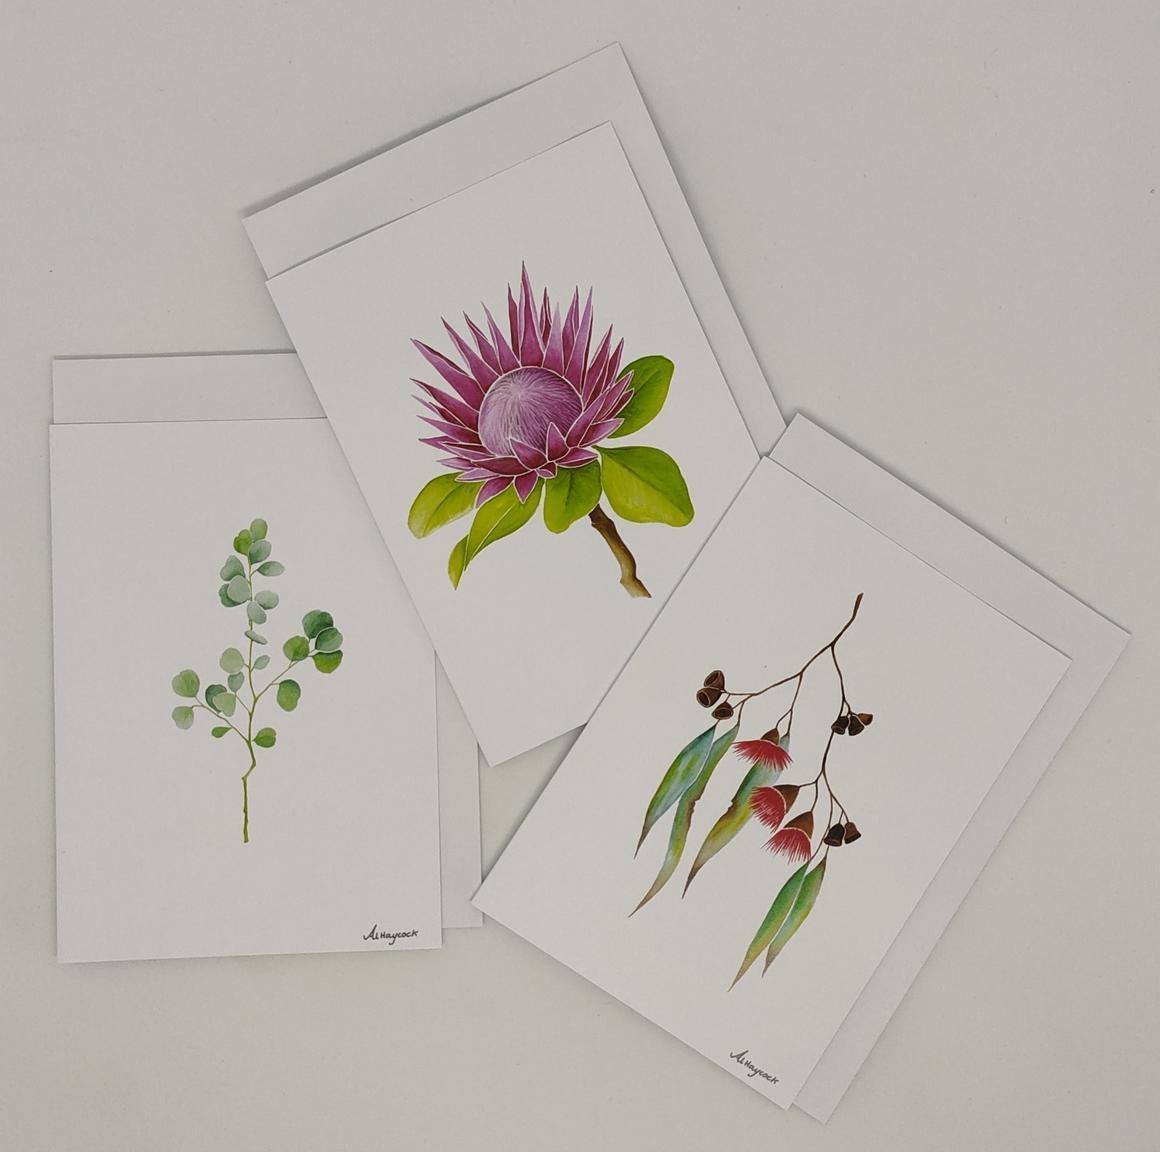 Gum Leaf, Protea, Gum Flower - 6 Pack of Cards | Trada Marketplace